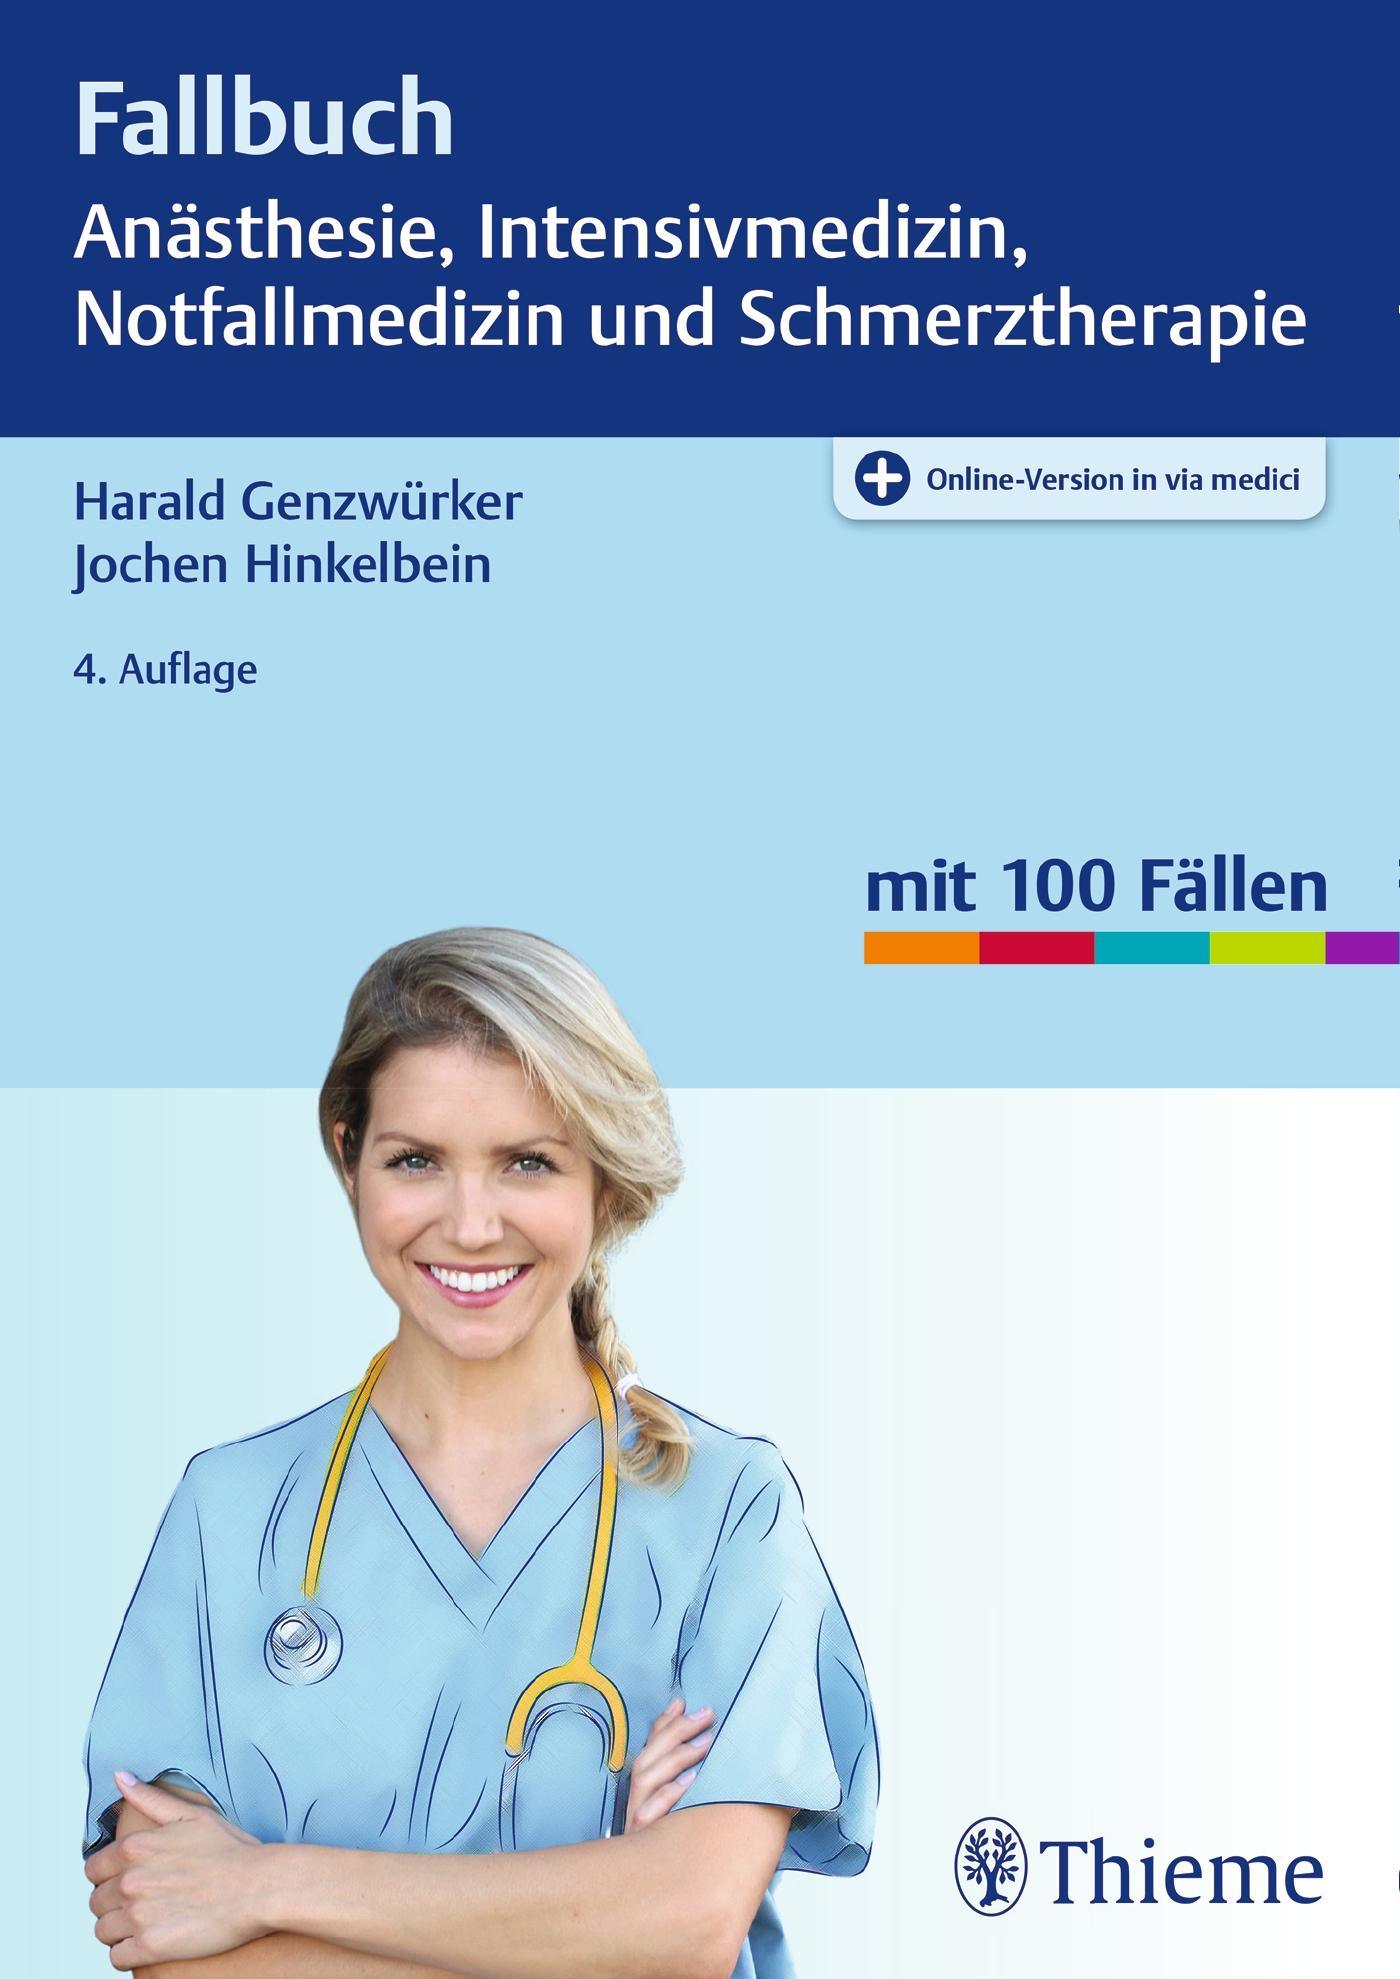 Fallbuch Anästhesie, Intensivmedizin und Notfallmedizin